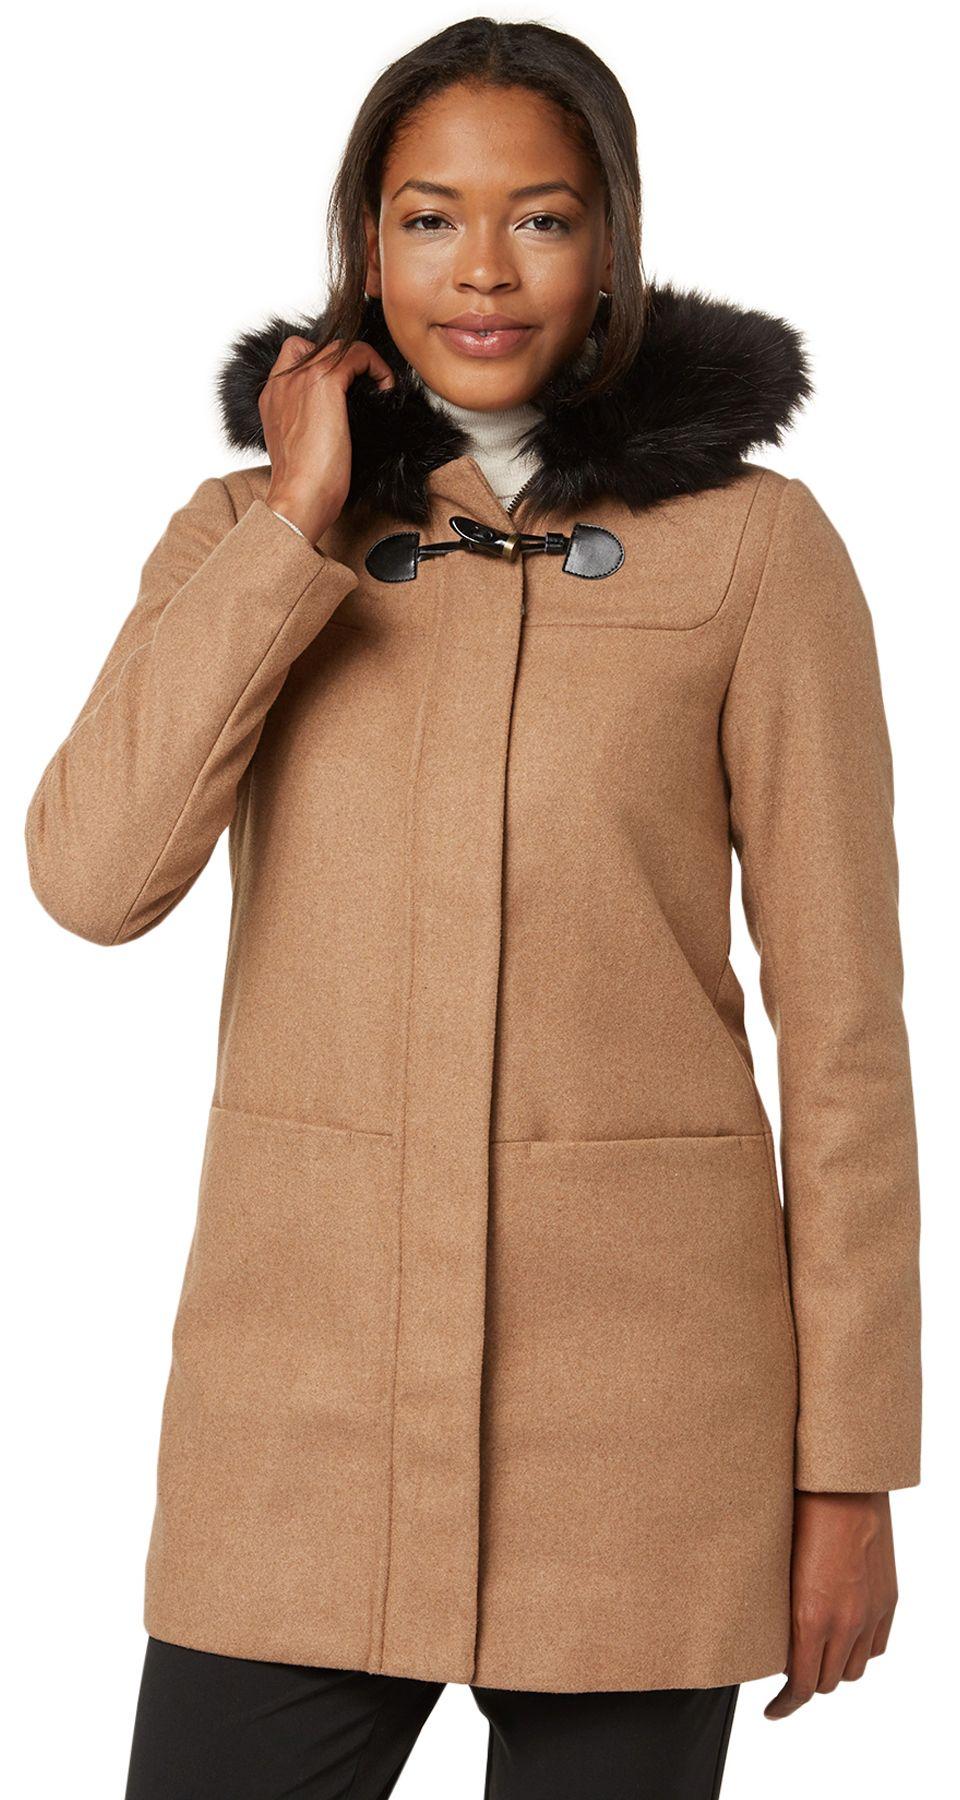 dufflecoats im schwab online shop damen m ntel. Black Bedroom Furniture Sets. Home Design Ideas